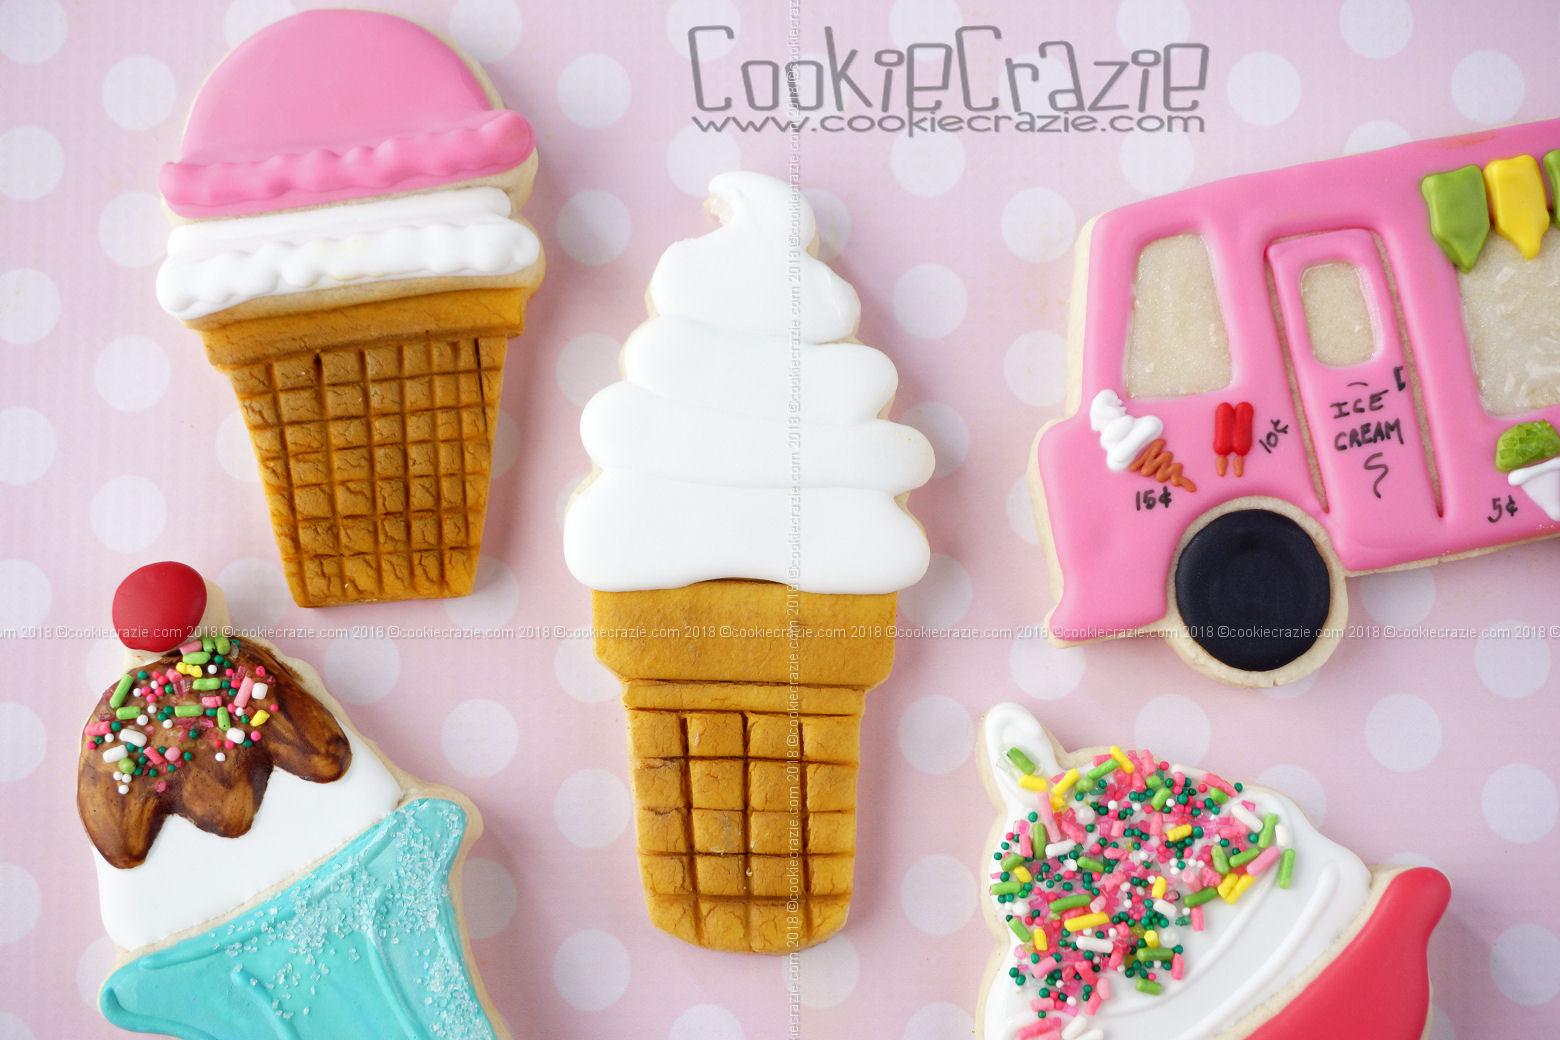 Soft Serve Ice Cream Cone Decorated Sugar Cookie YouTube video  HERE